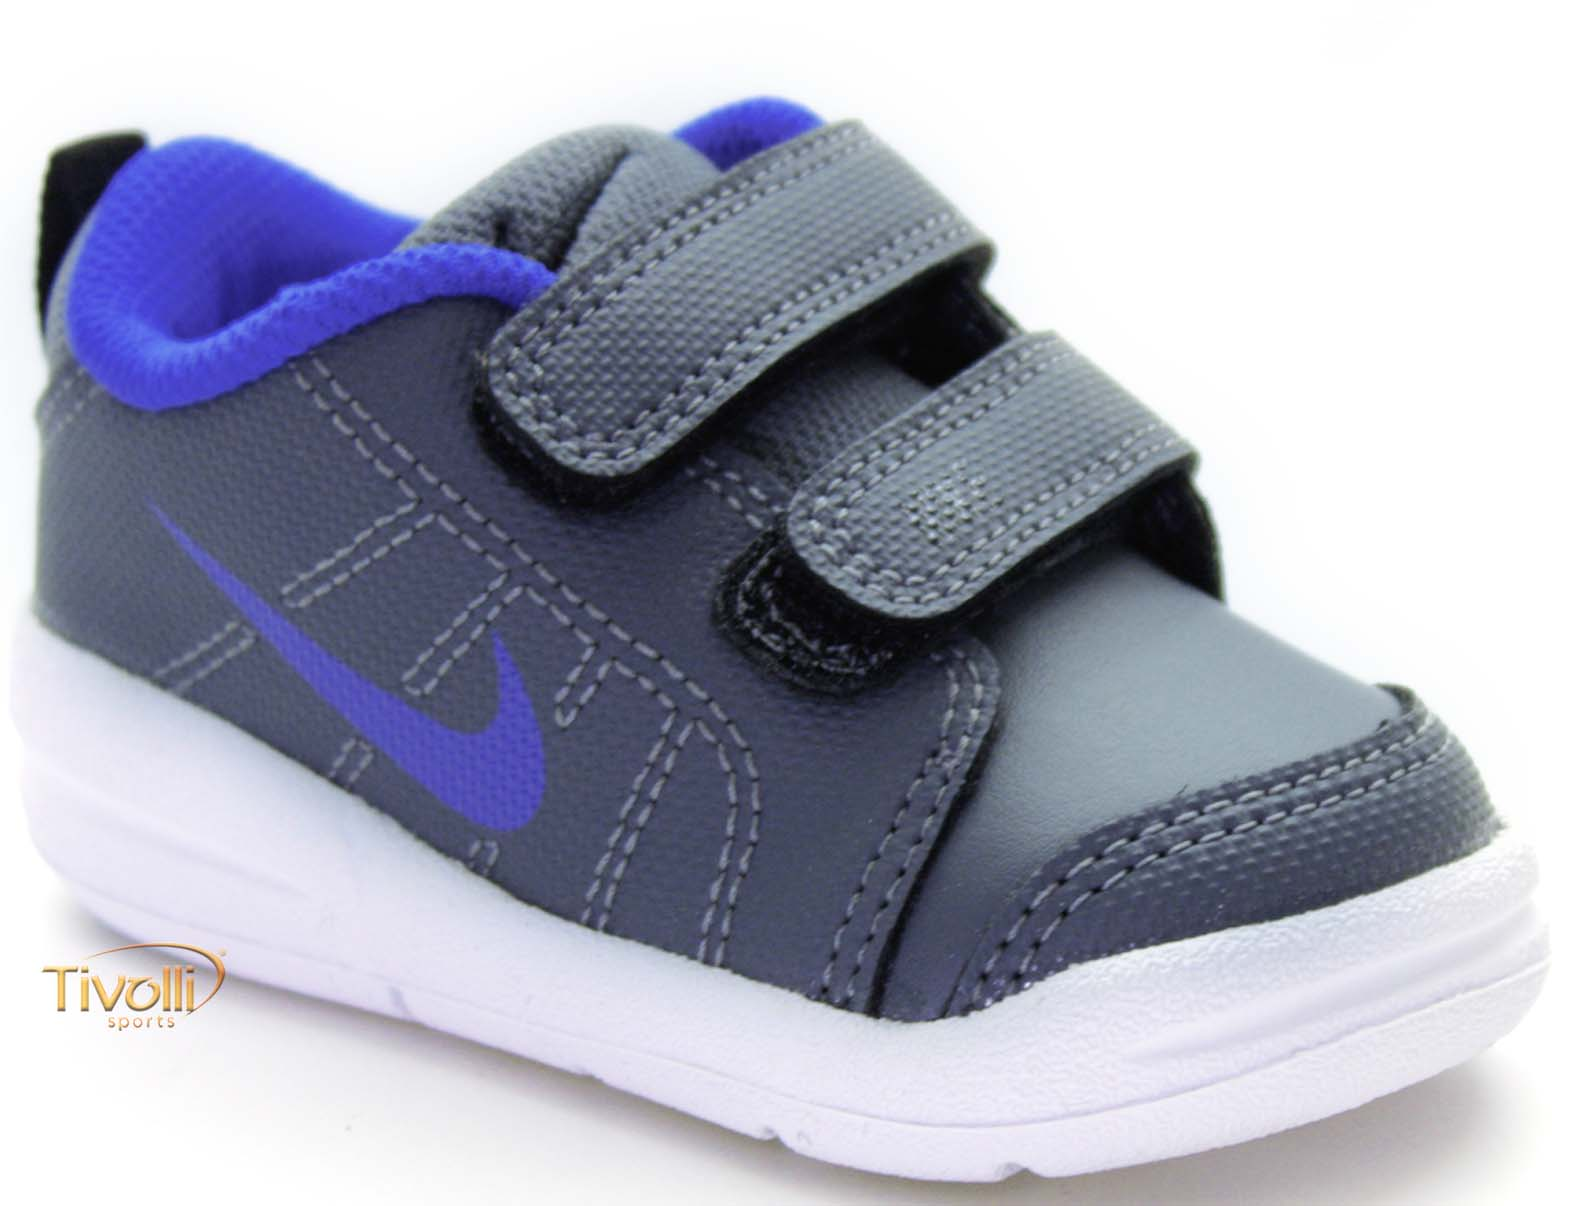 fb46ab3791 Tênis Nike Pico LT (TDV) Infantil   tam. 18 ao 26